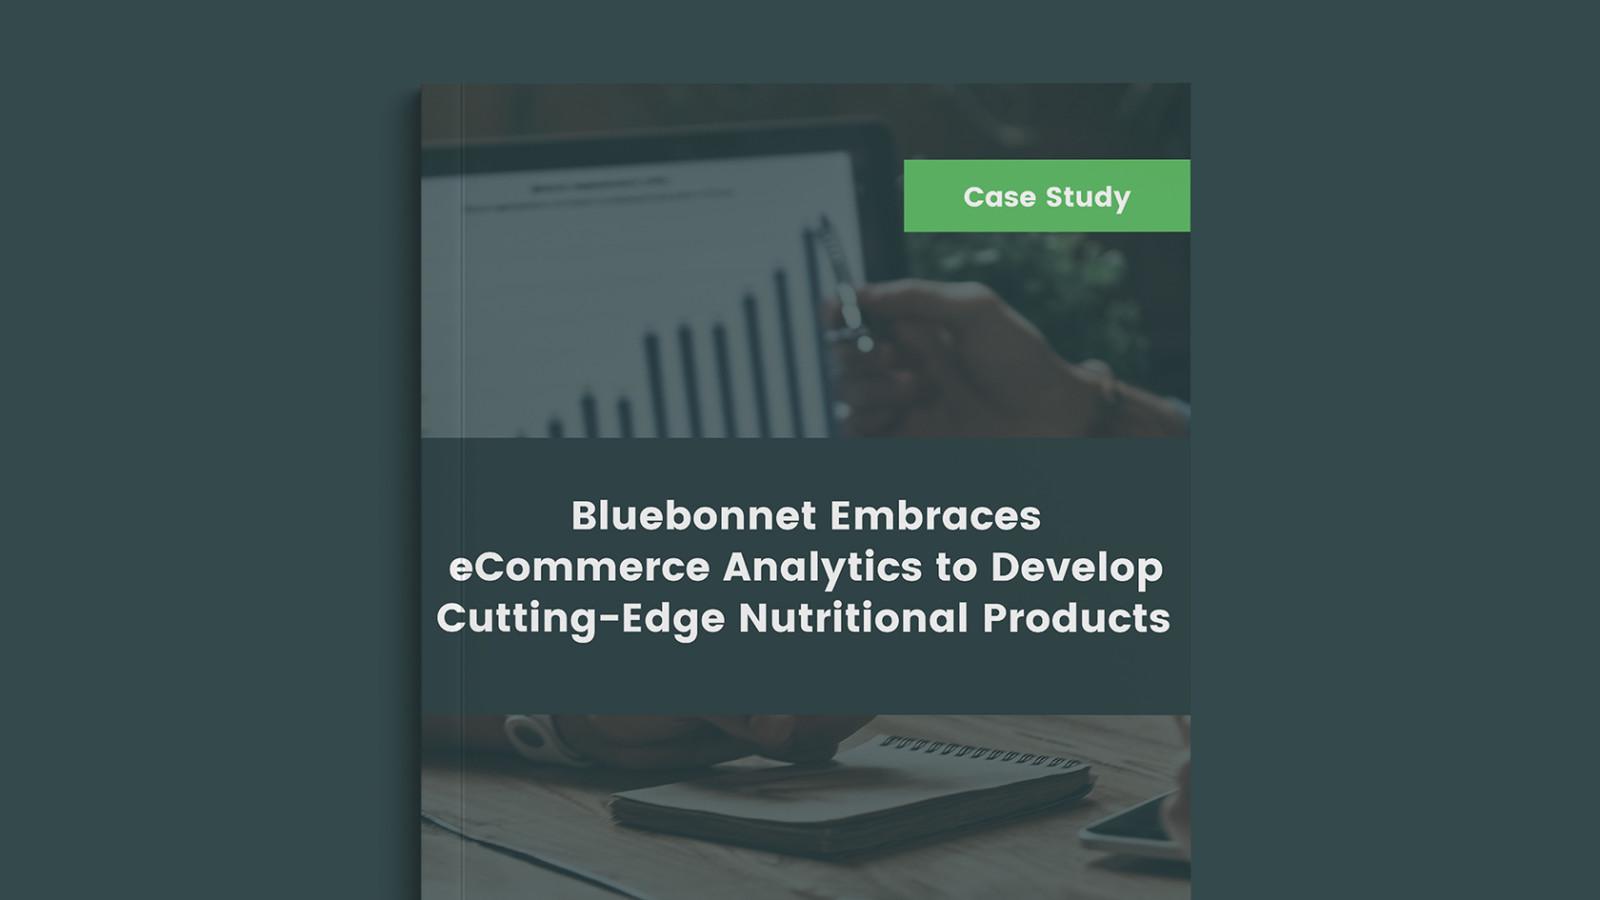 eCommerce Market Intelligence Drives Development of Winning Products